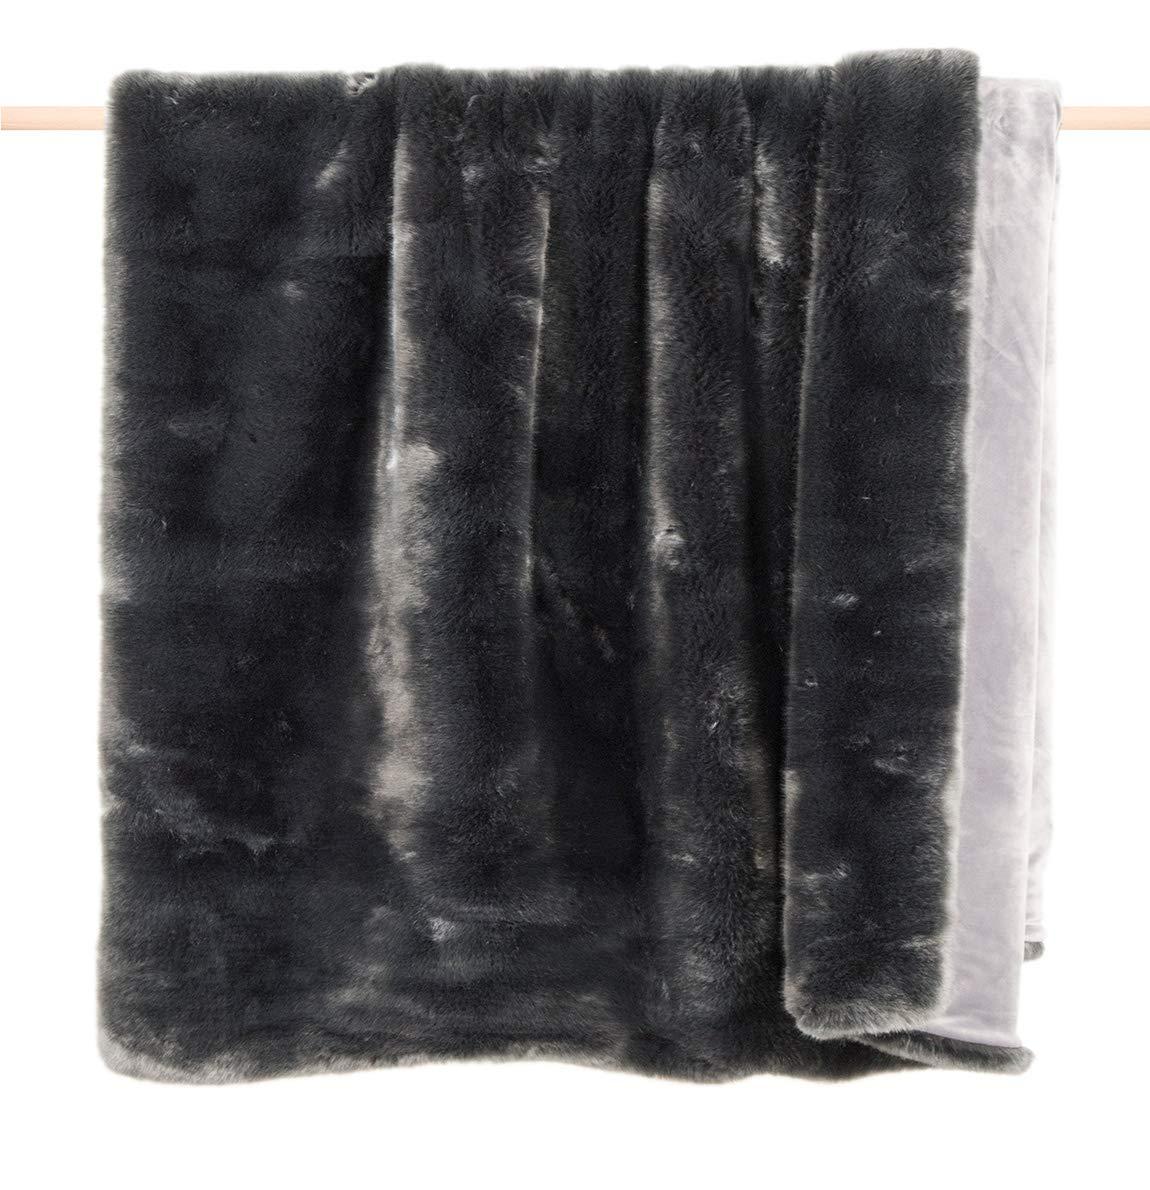 Pad - Decke - Kuscheldecke - Wohndecke - Sheridan - Kunstfell - Grau grau - 140 x 190 cm